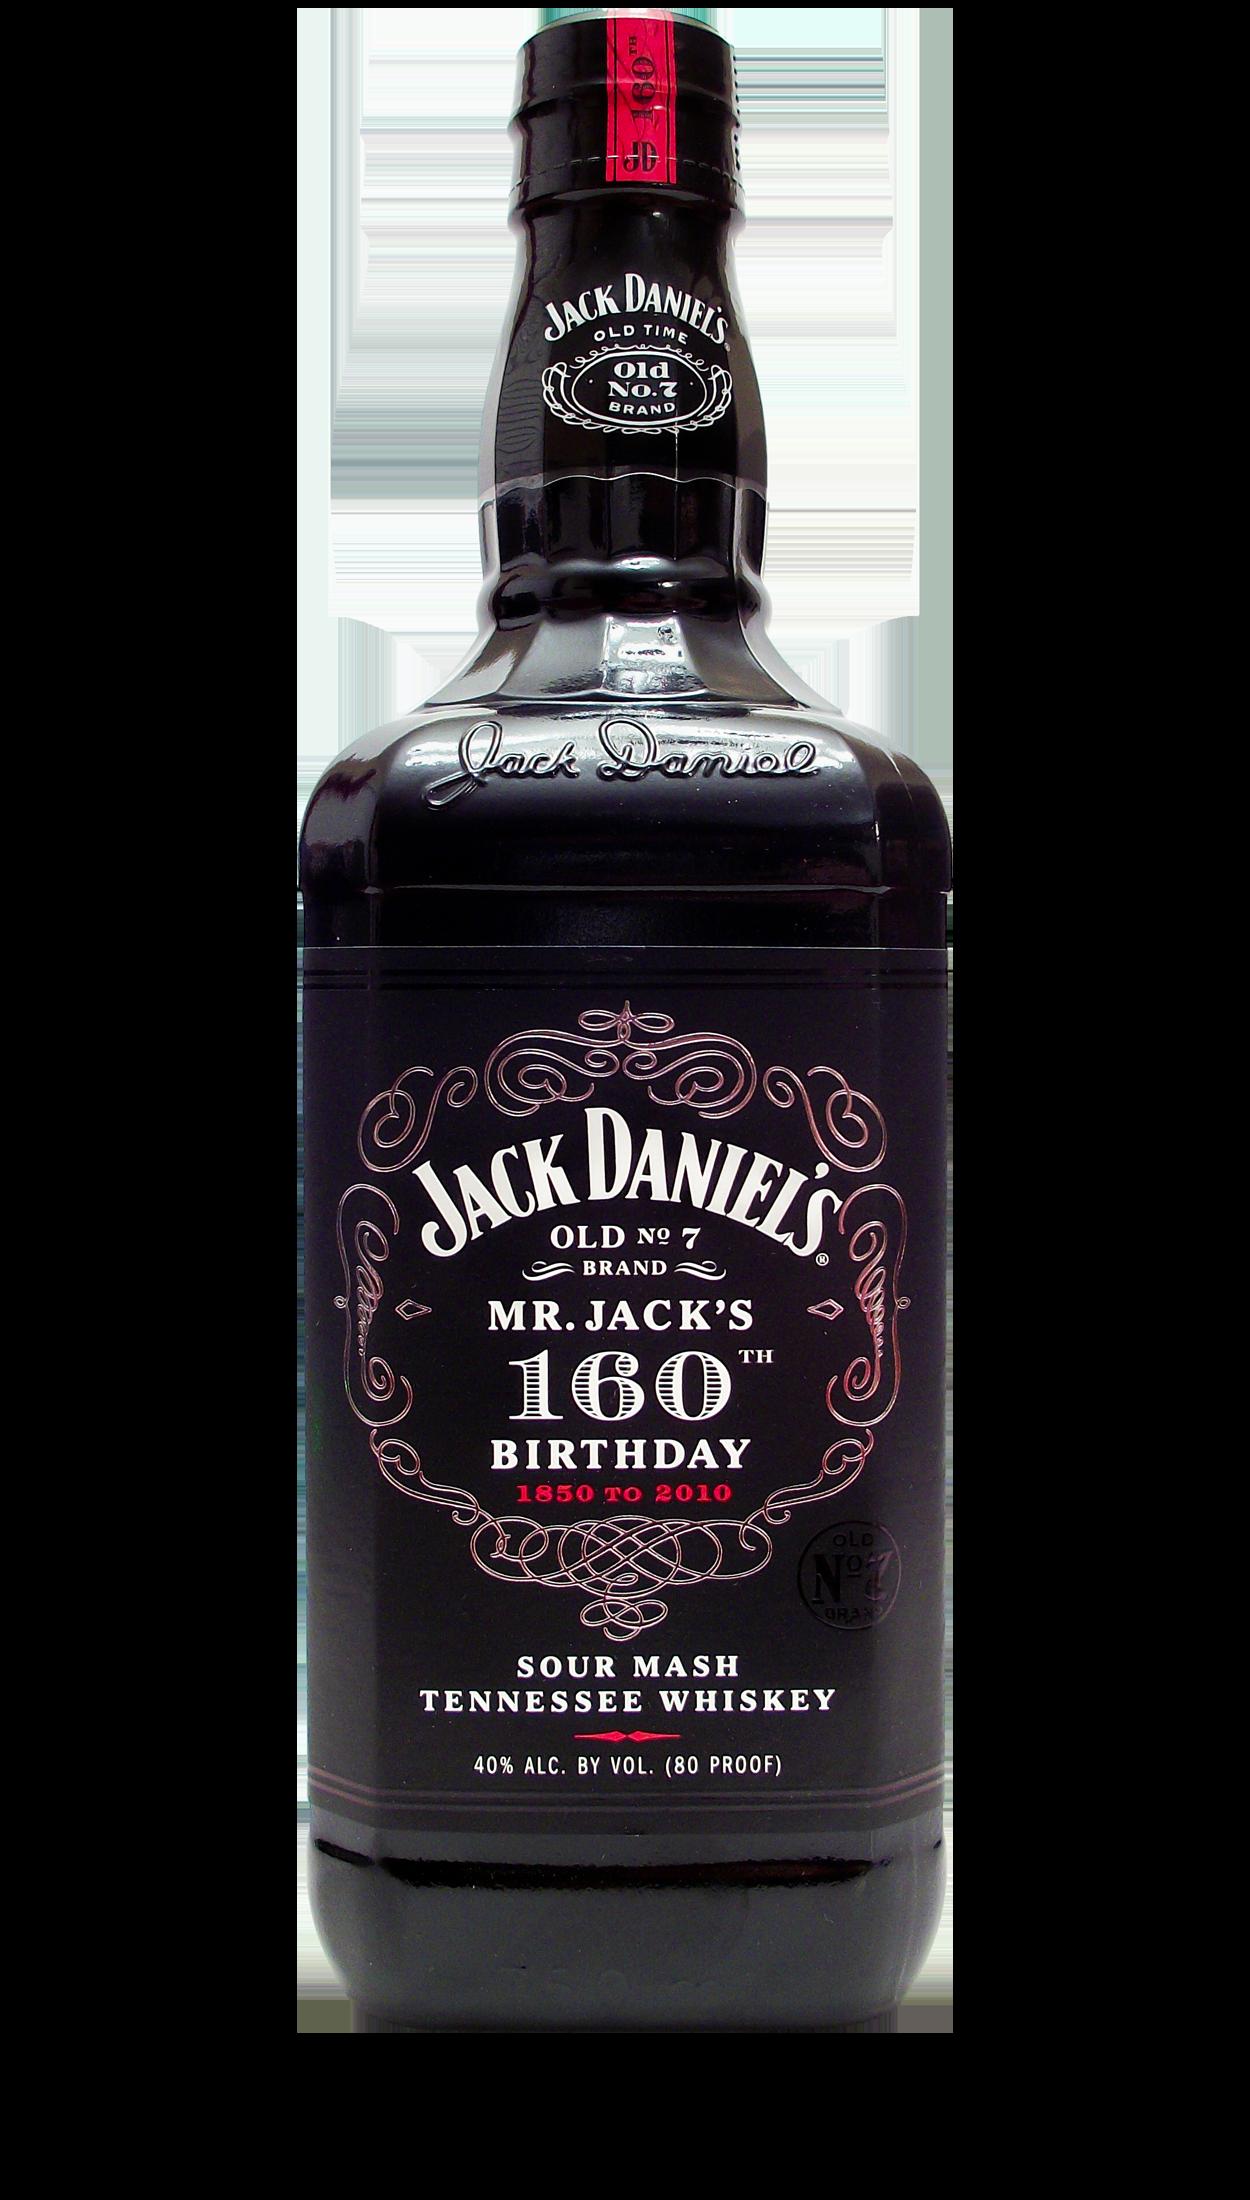 Bottles Jack Daniels Bottles Jack Daniels Bottle Jack Daniels Whiskey